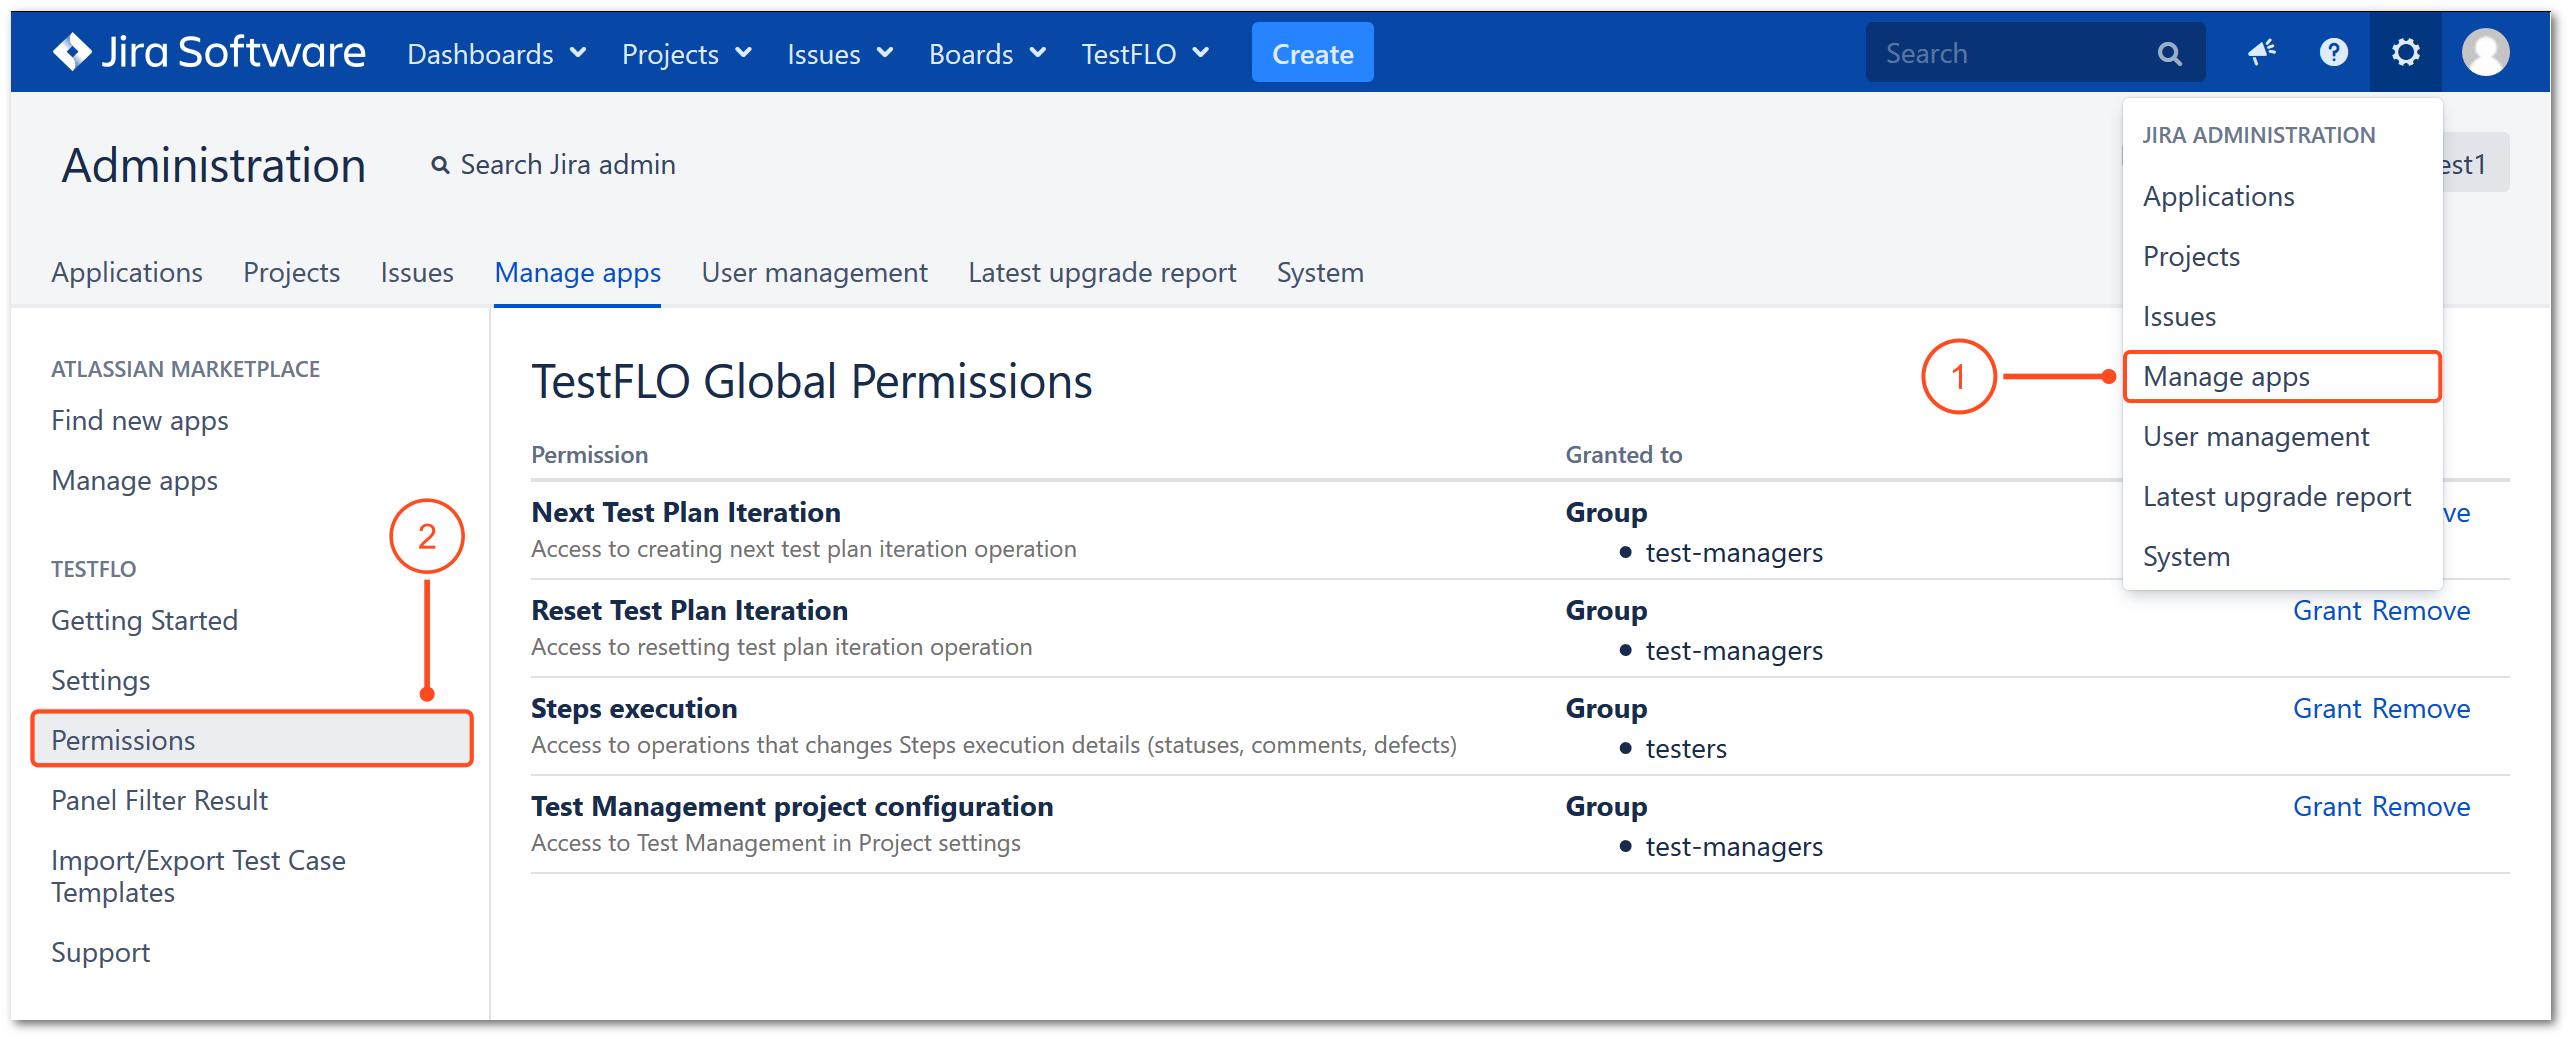 TestFLO Global Permissions